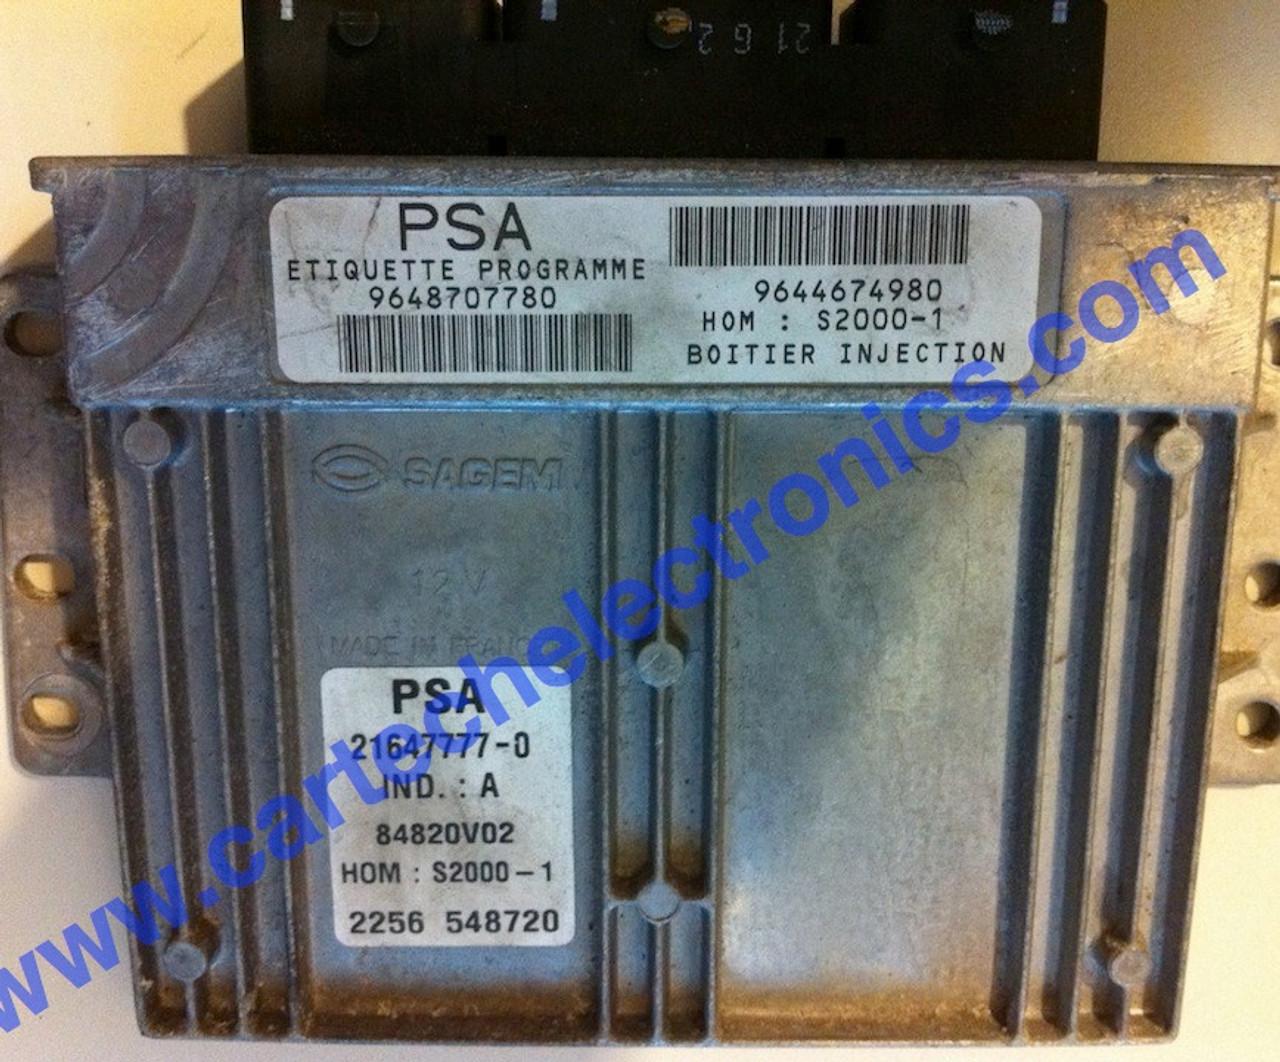 Plug & Play Engine ECU PSA S2000-1 9648707780 9644674980 21647777-0